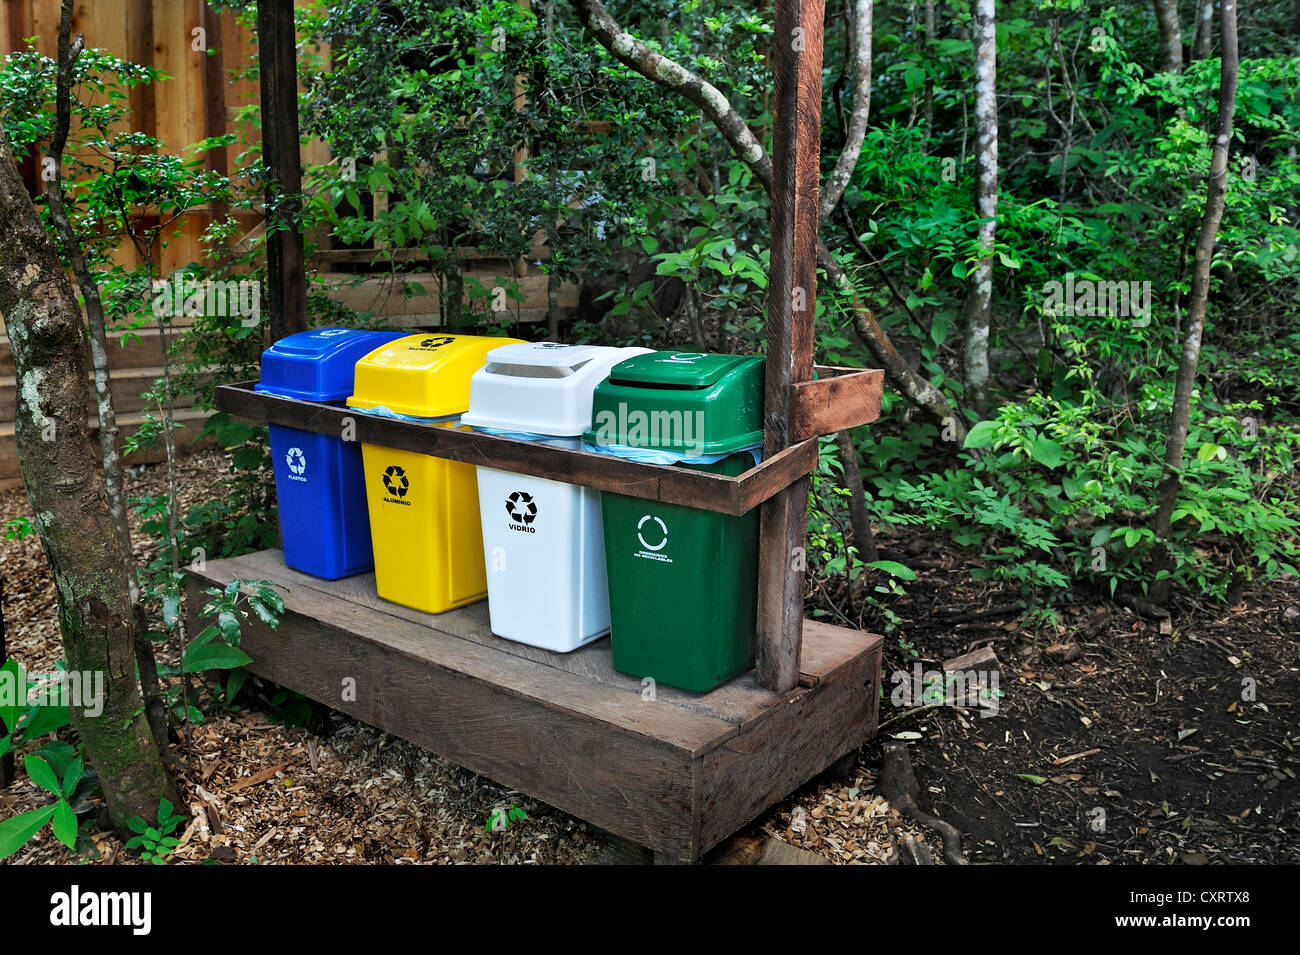 Exemplary waste separation, hot springs near the Hacienda Guachipelin, near Liberia, Guanacaste province, Costa - Stock Image